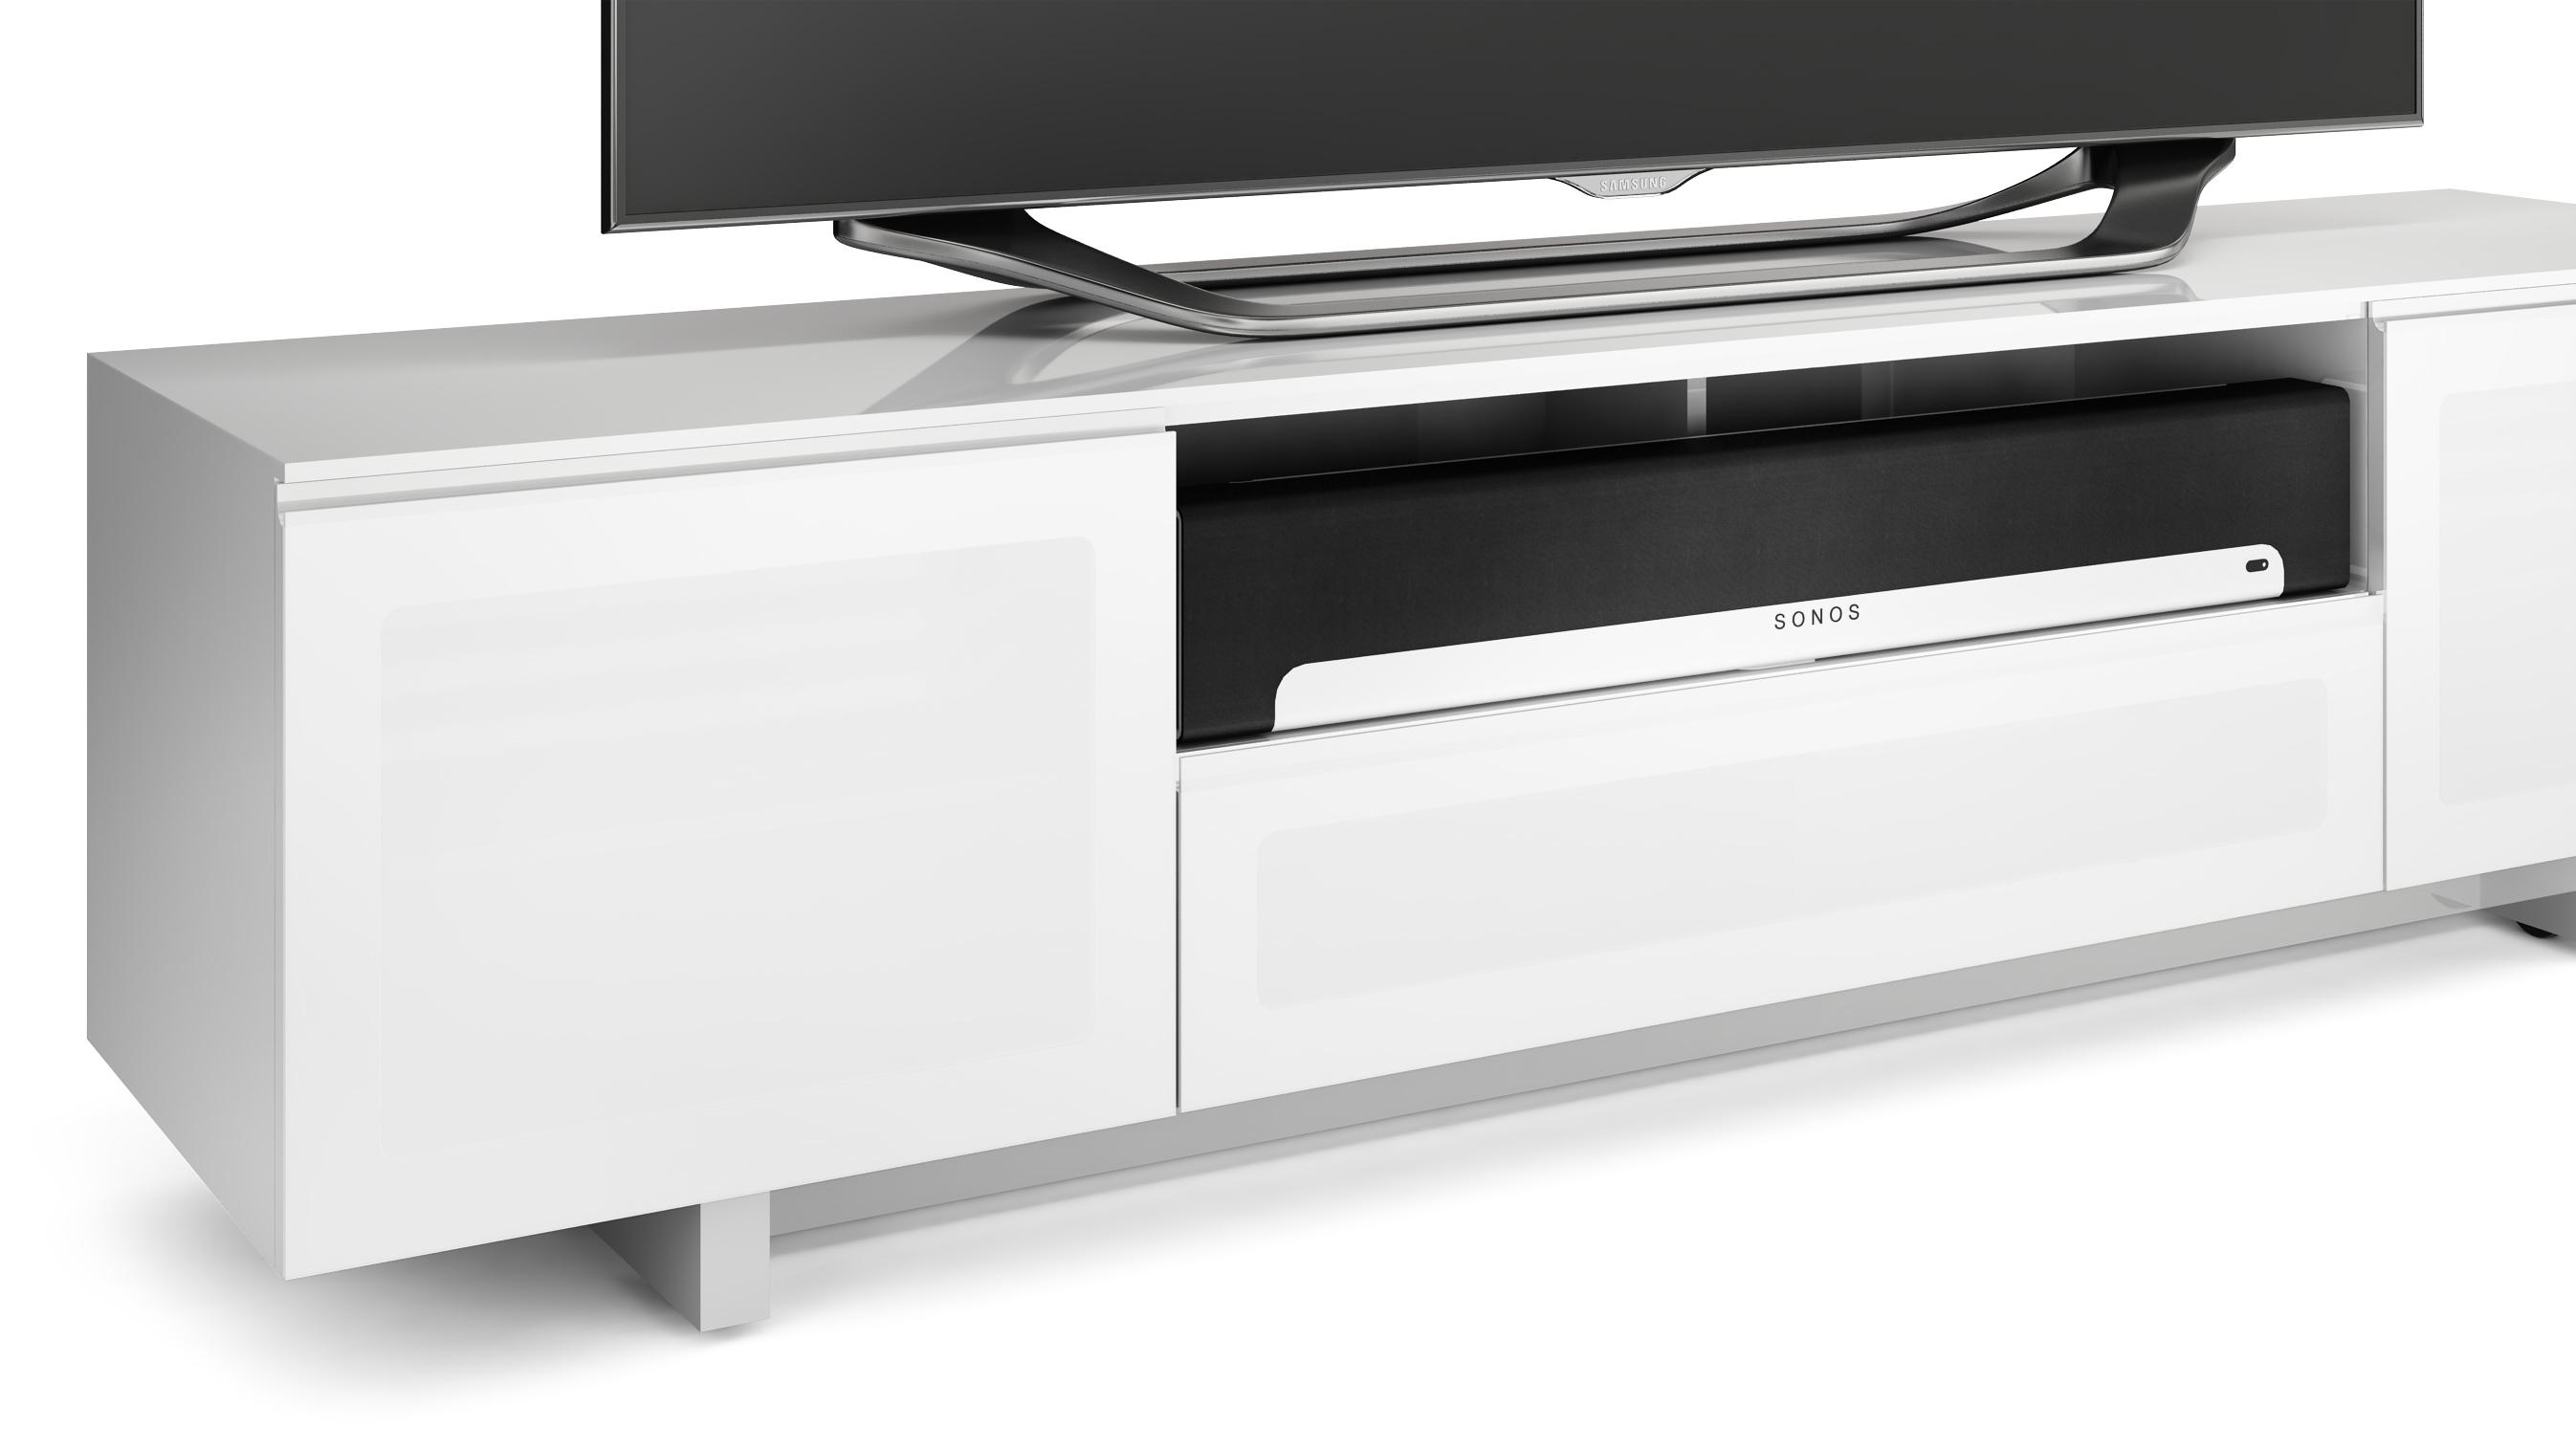 ballard designs home furniture of bdi cupboard best richfielduniversity fresh fice modern office